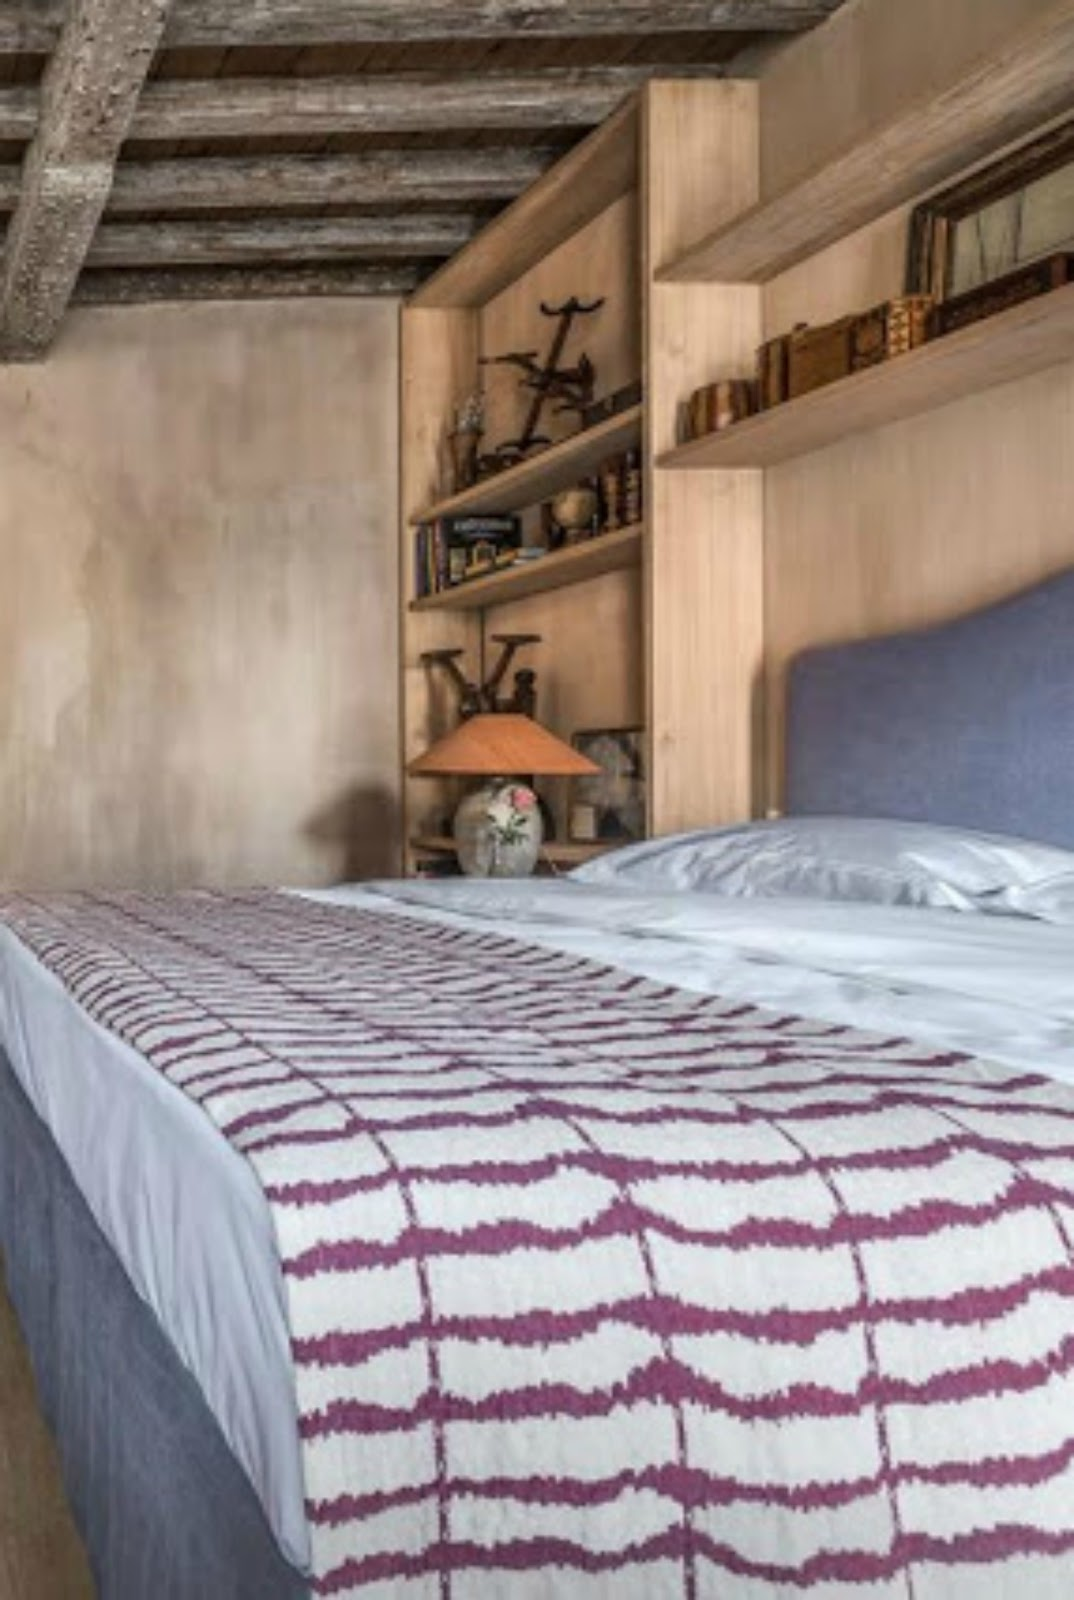 Belgian interior design in a Bruges bedroom - found on Hello Lovely Studio